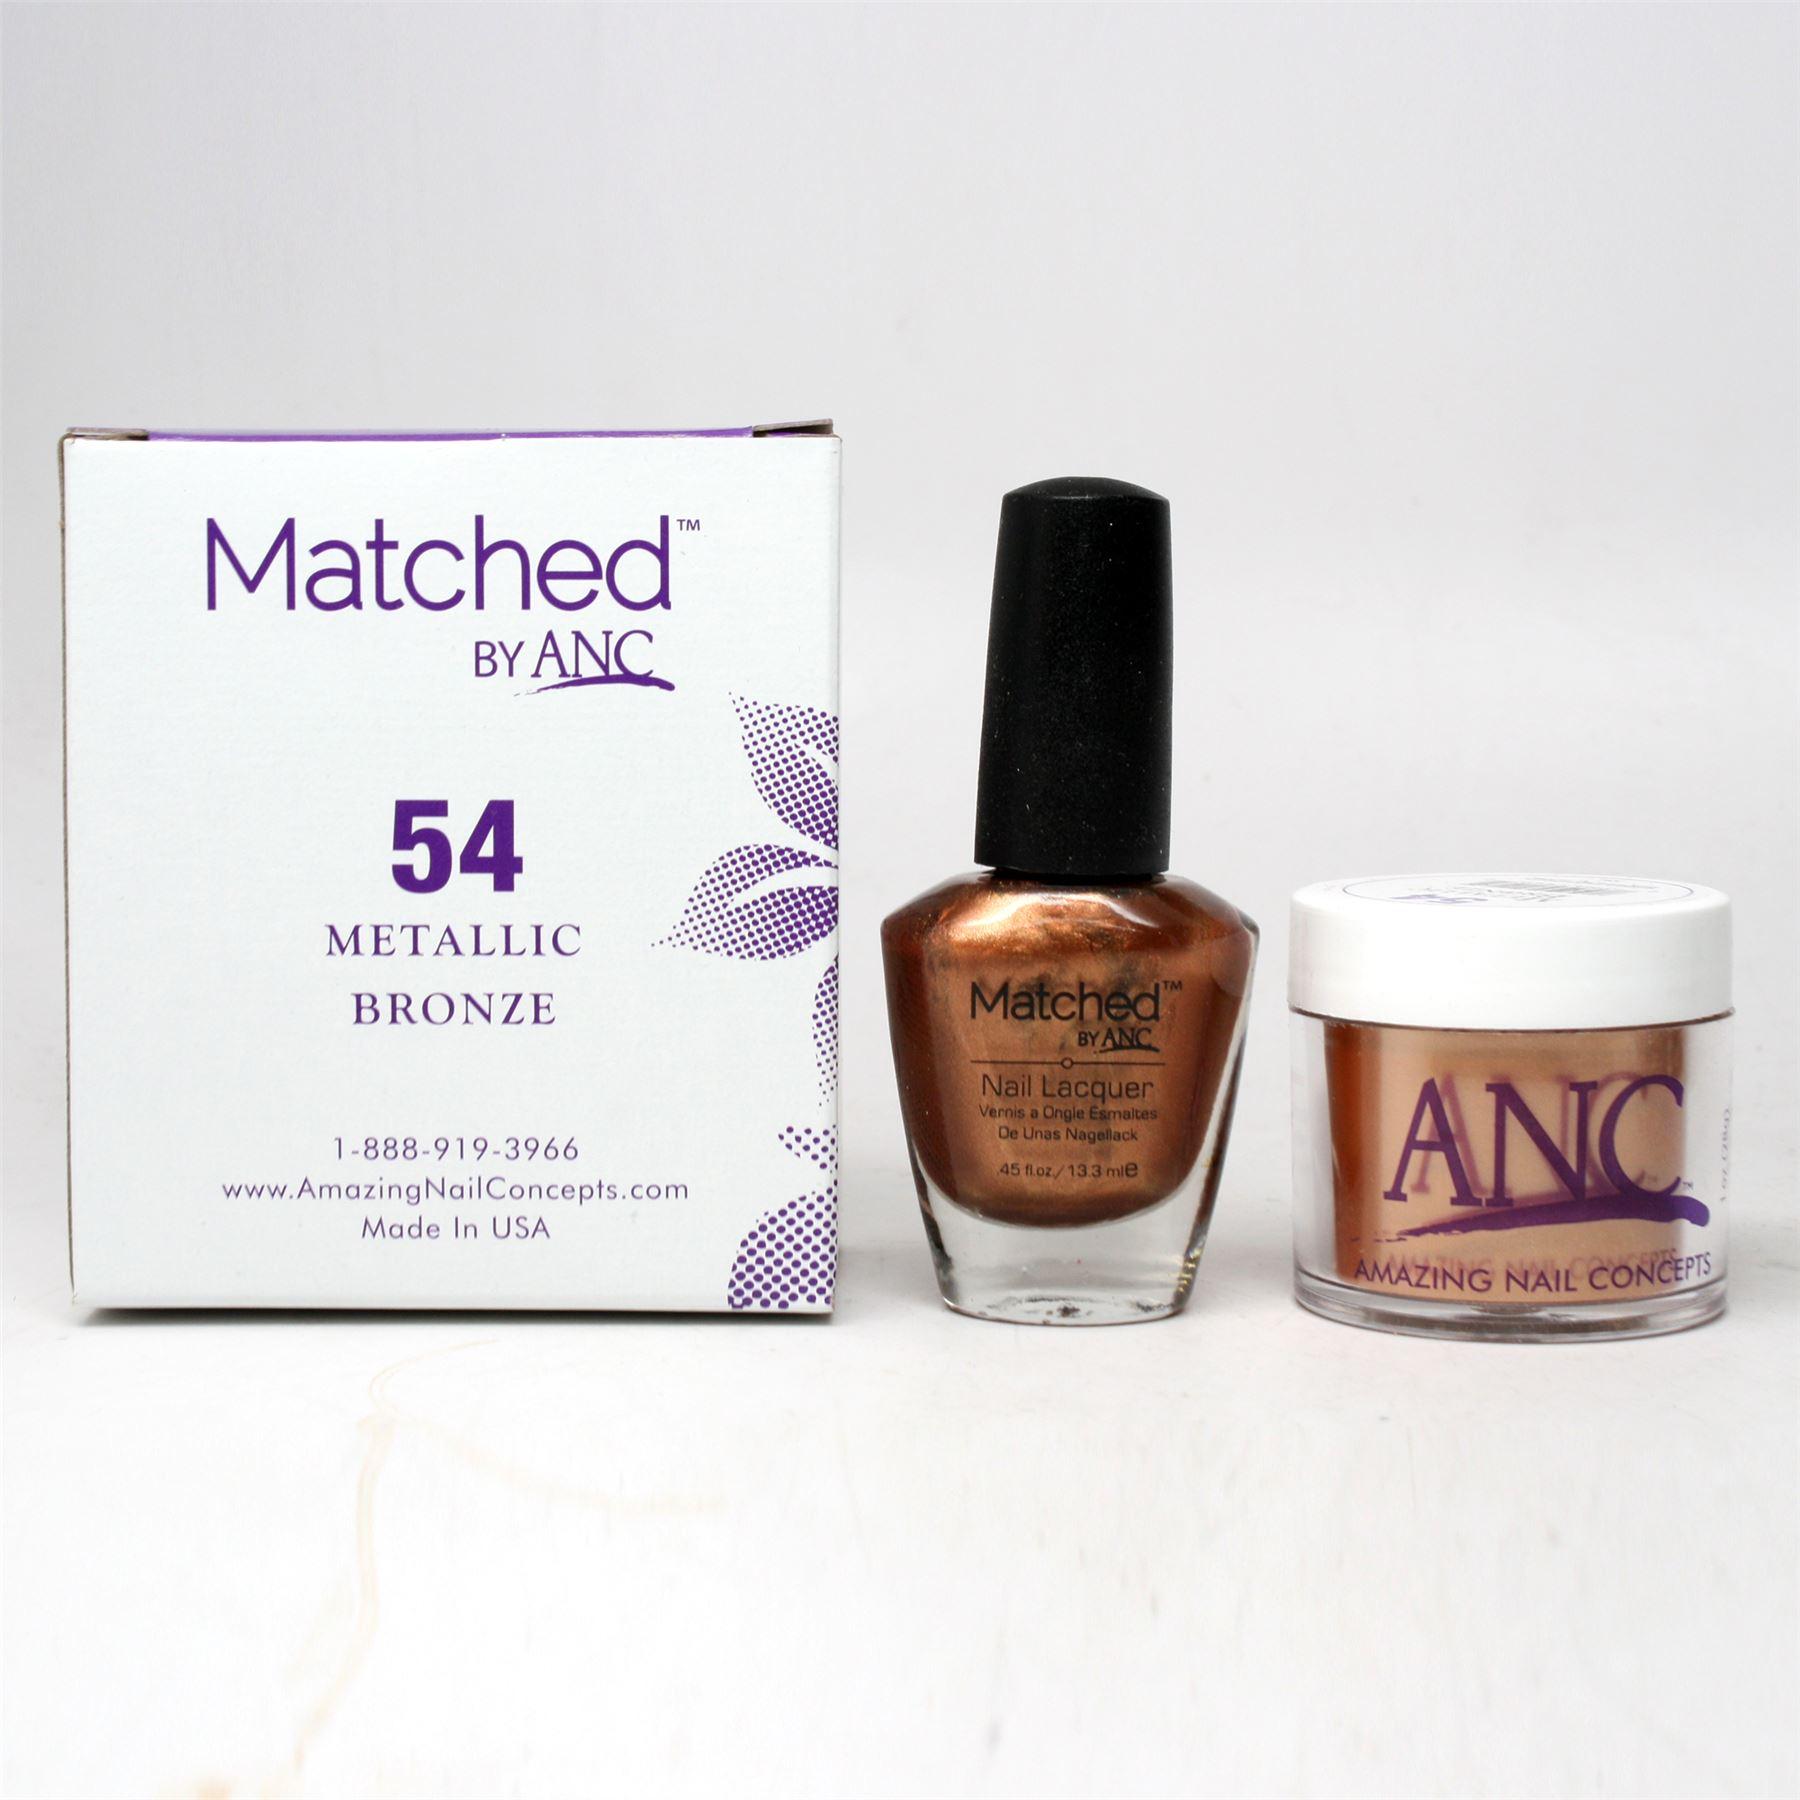 ANC Amazing Nail Concepts Matched Kit # 54 Metallic Bronze